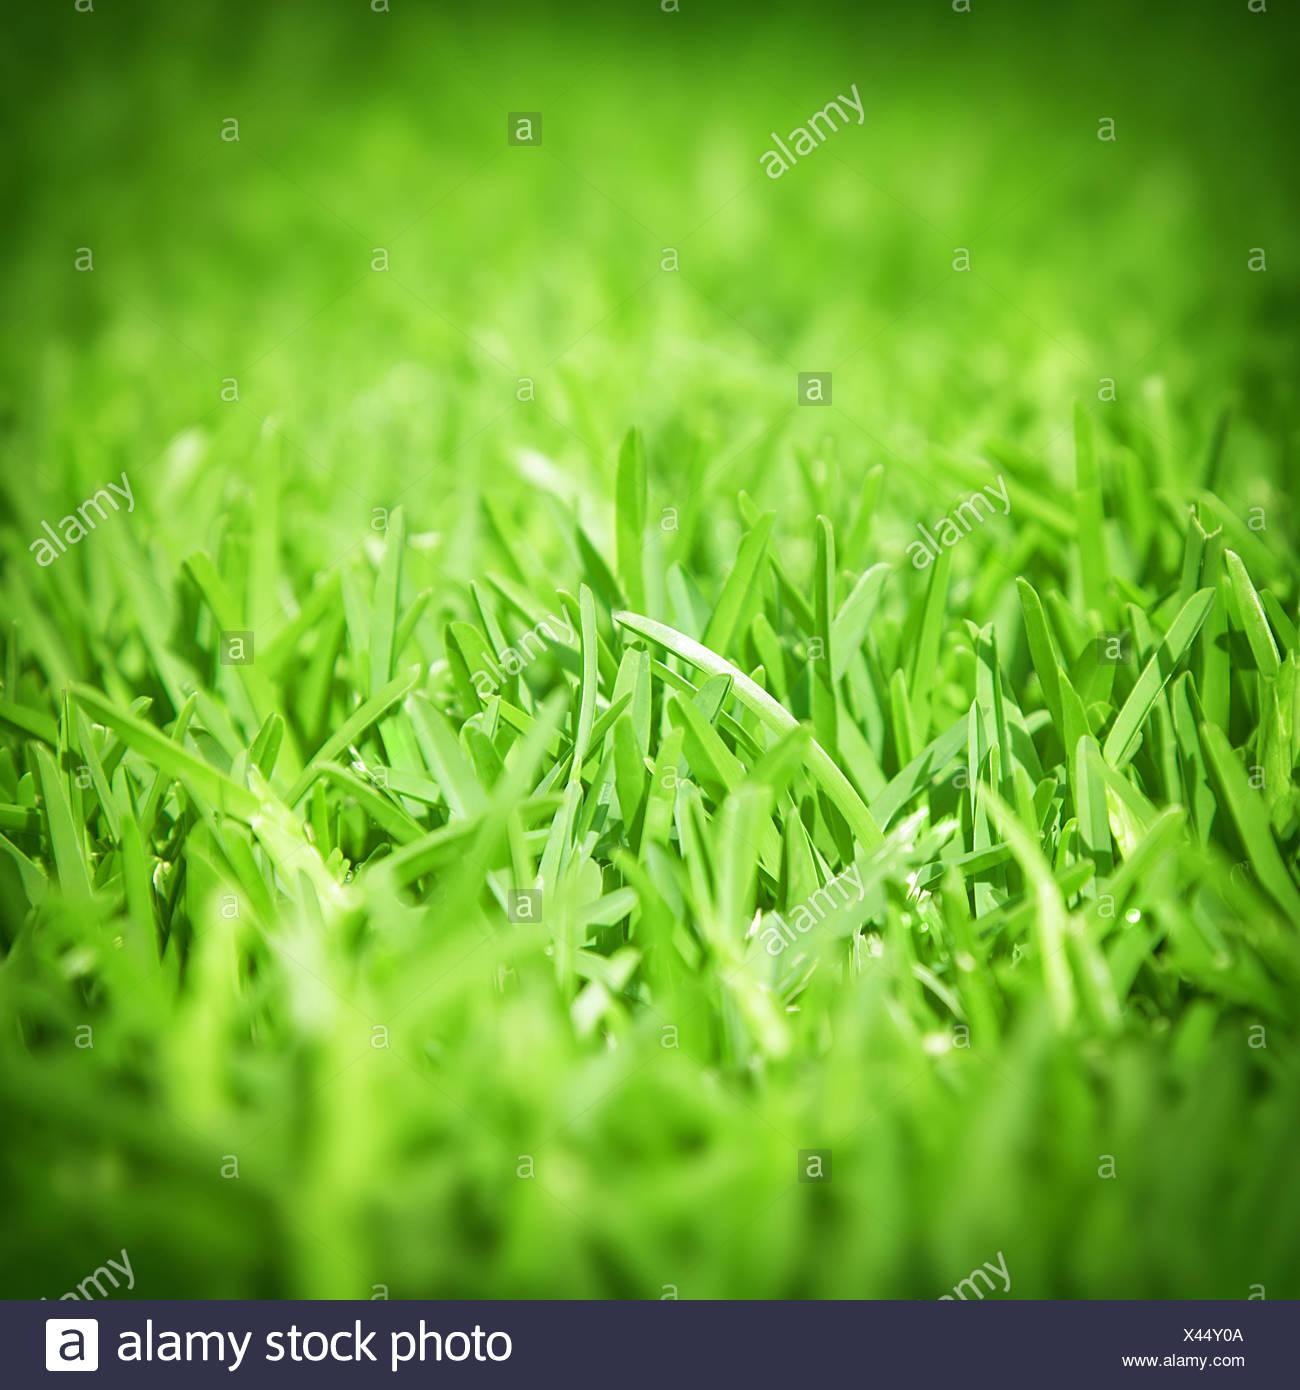 Spring Green Grass Background, Fresh Natural Textured